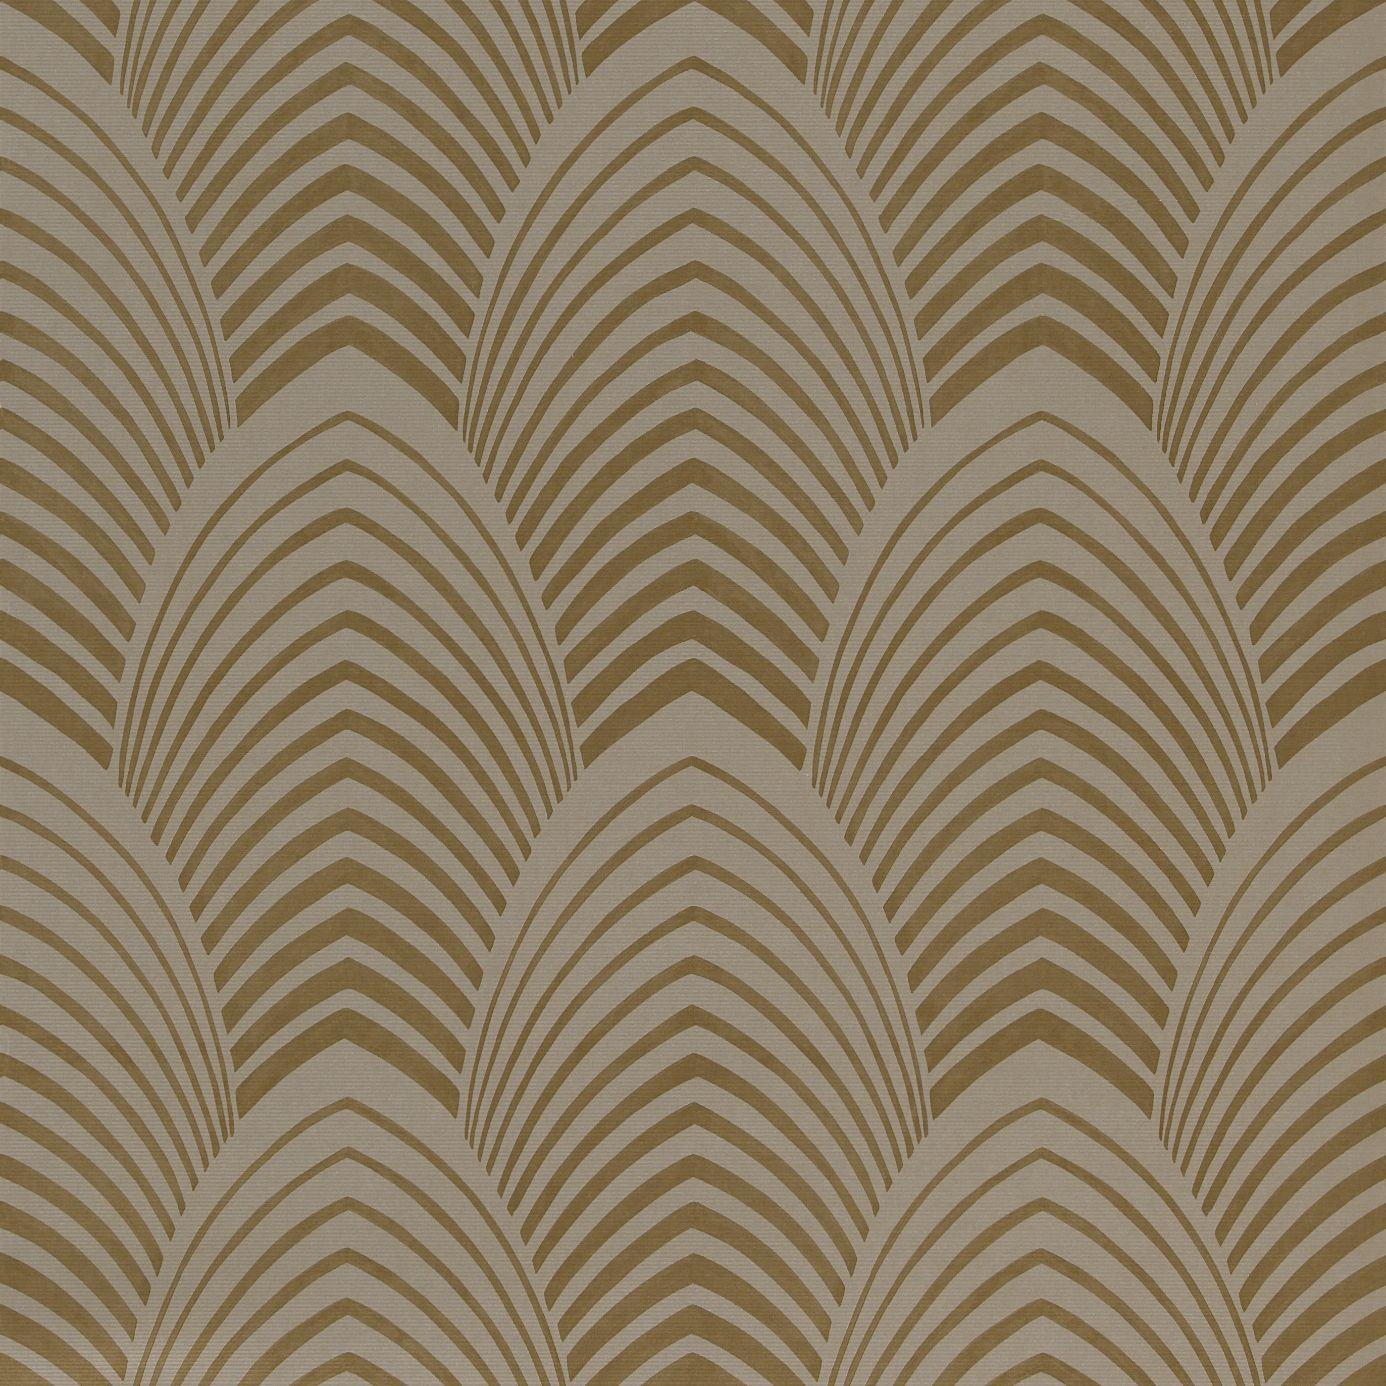 Art Deco Wallpaper 22 Wallpapers – Adorable Wallpapers